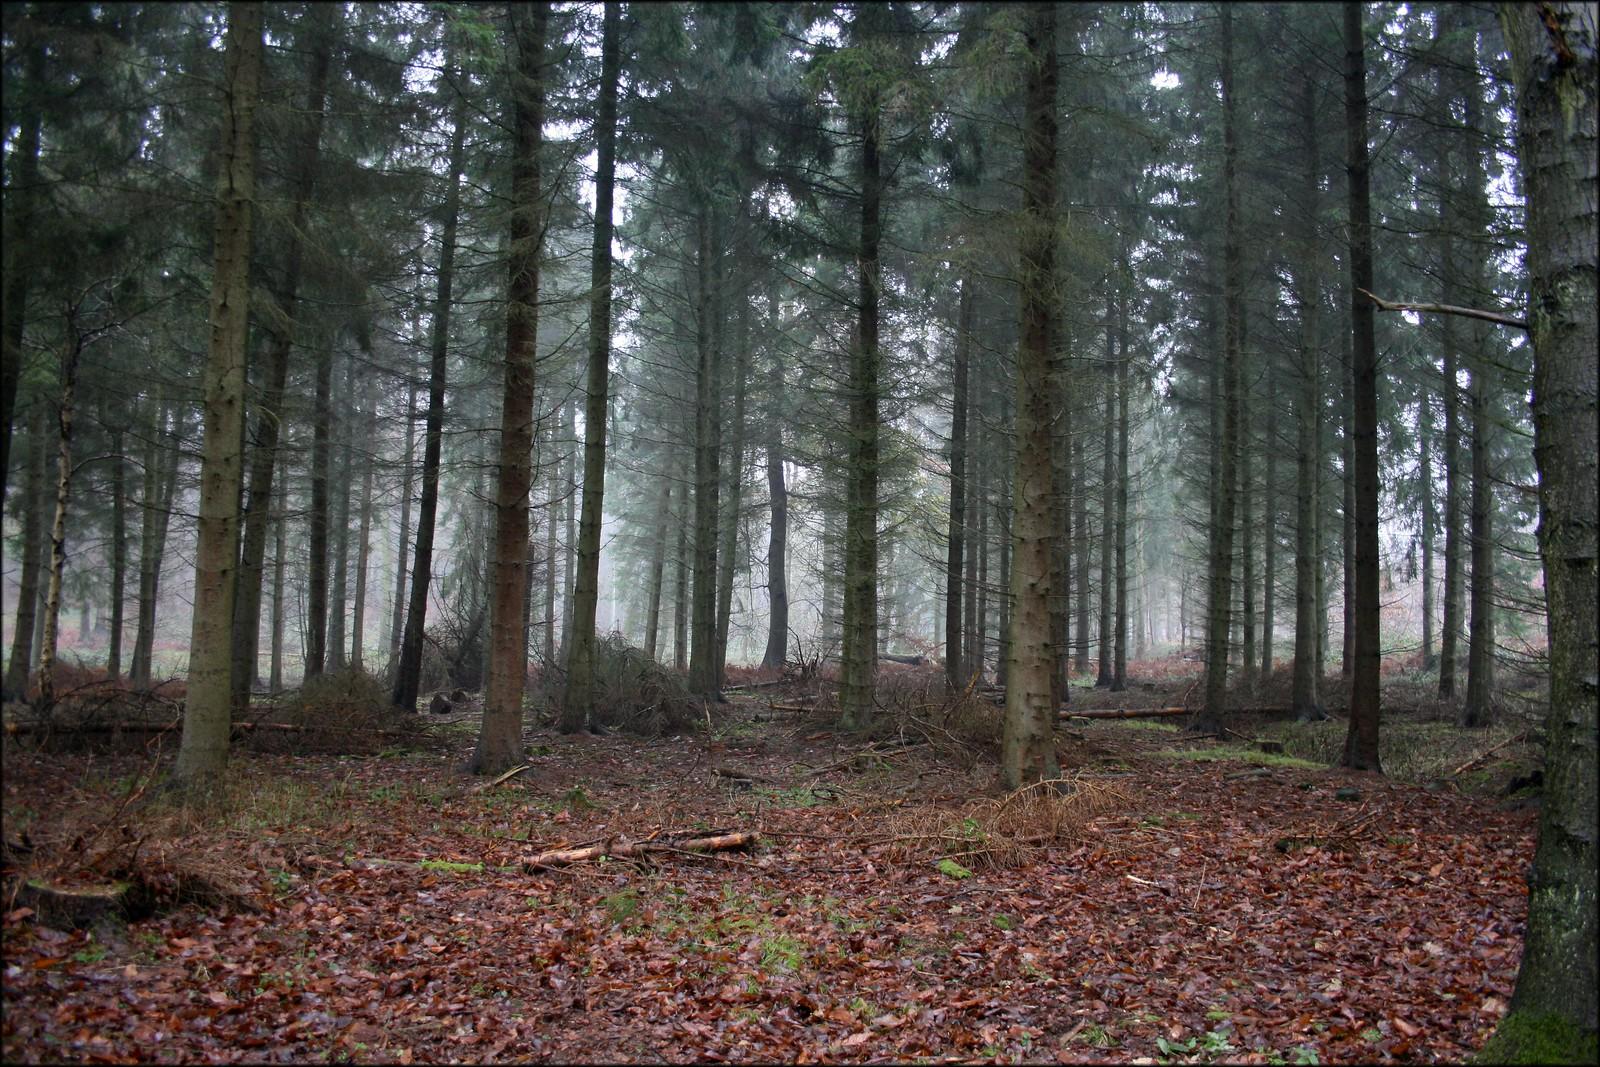 Back Wood, Bow Brickhill Misty woodland near Bow Brickhill, Buckinghamshire